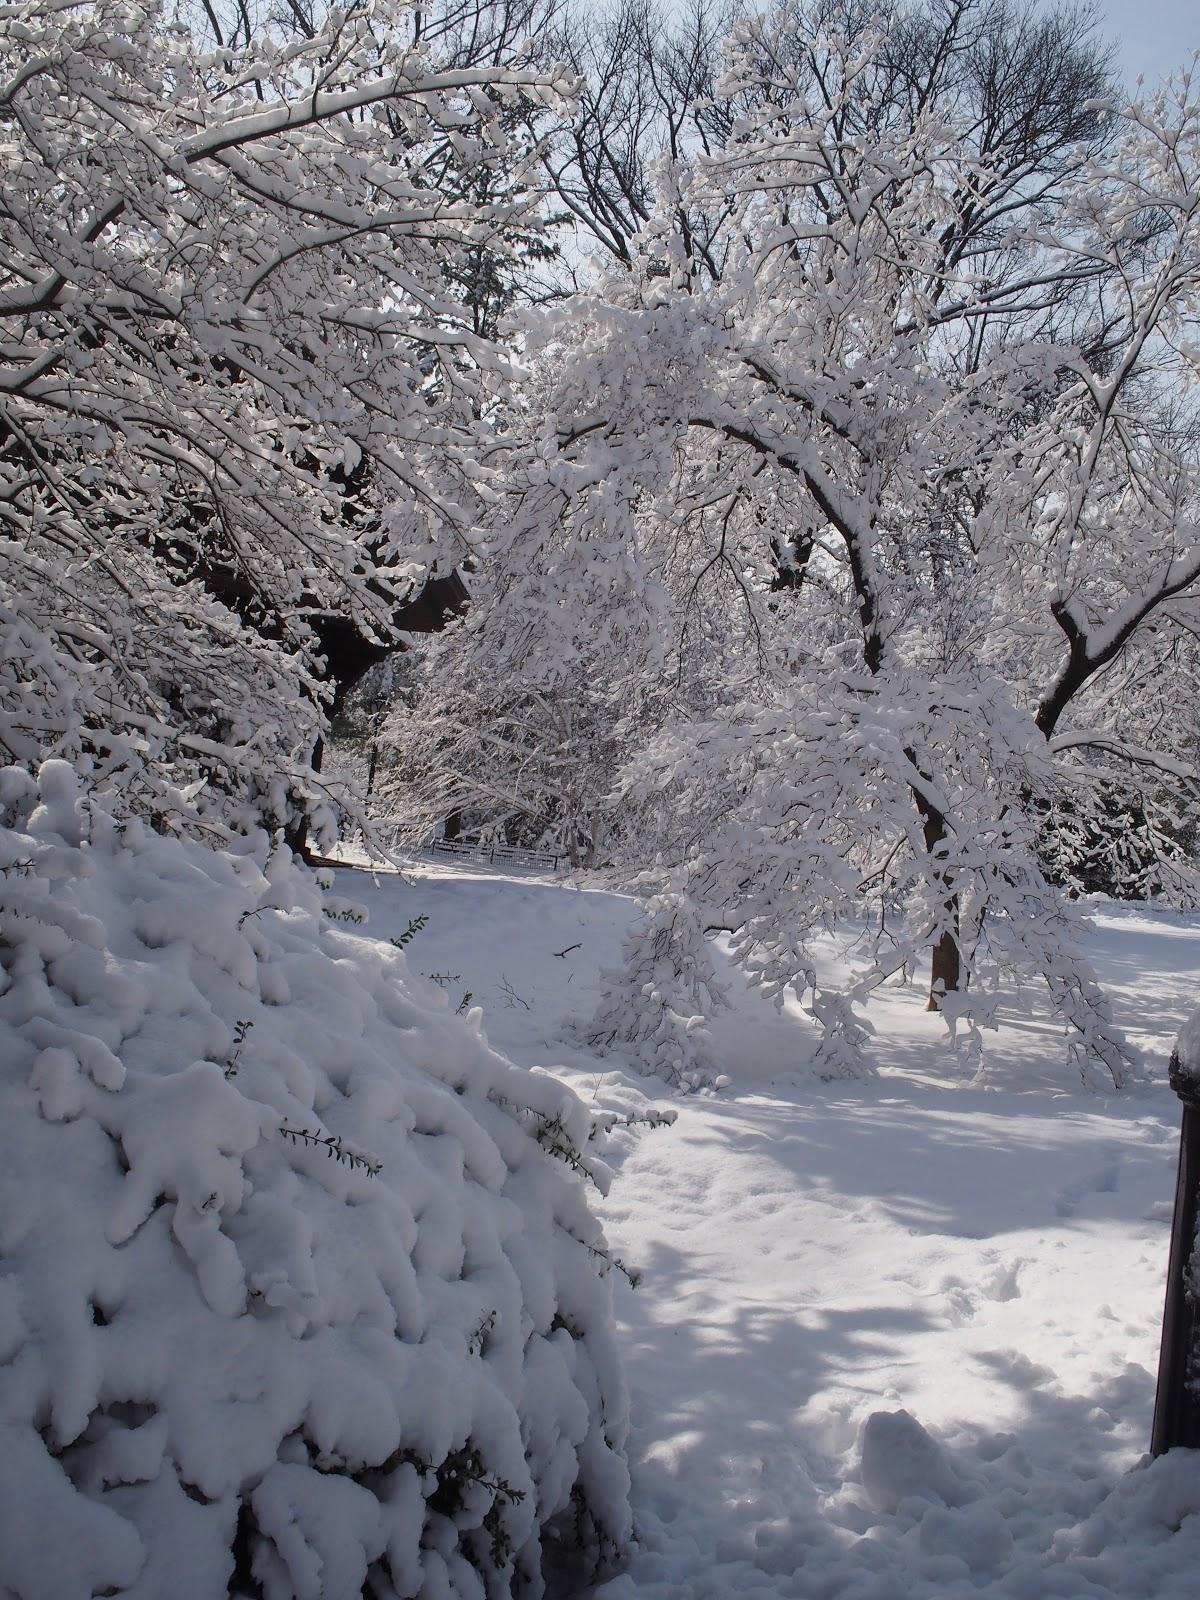 Winter Wonderland, #centralpark #nyc #snow 2013